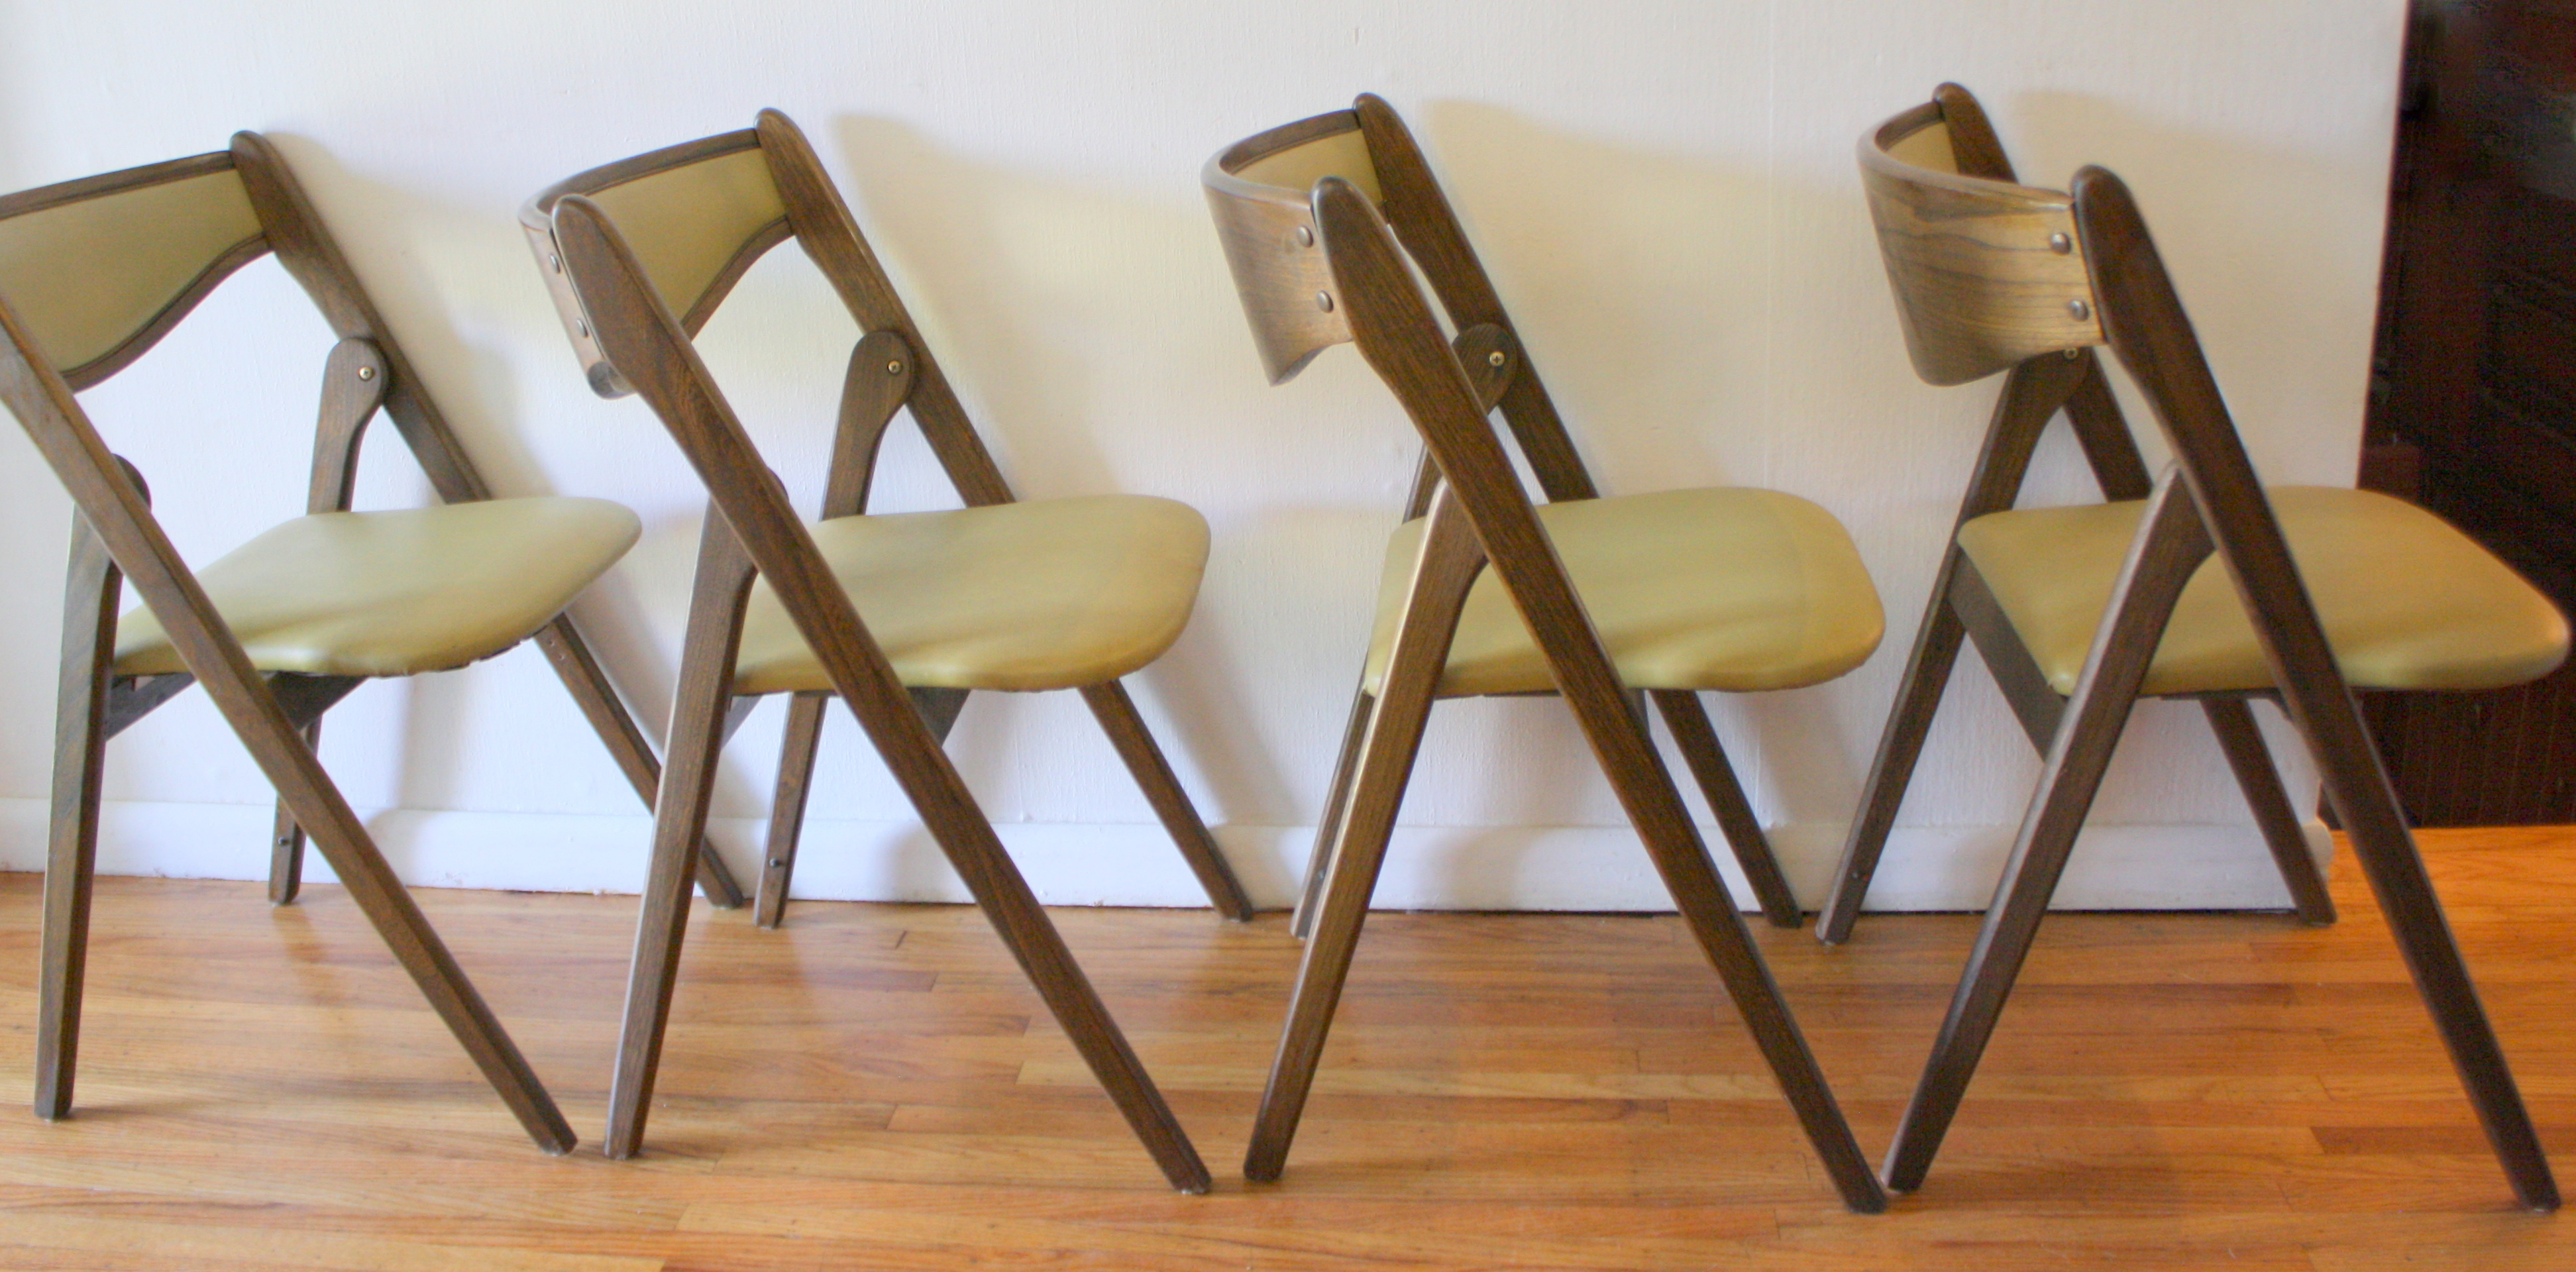 Coronet folding chairs 2